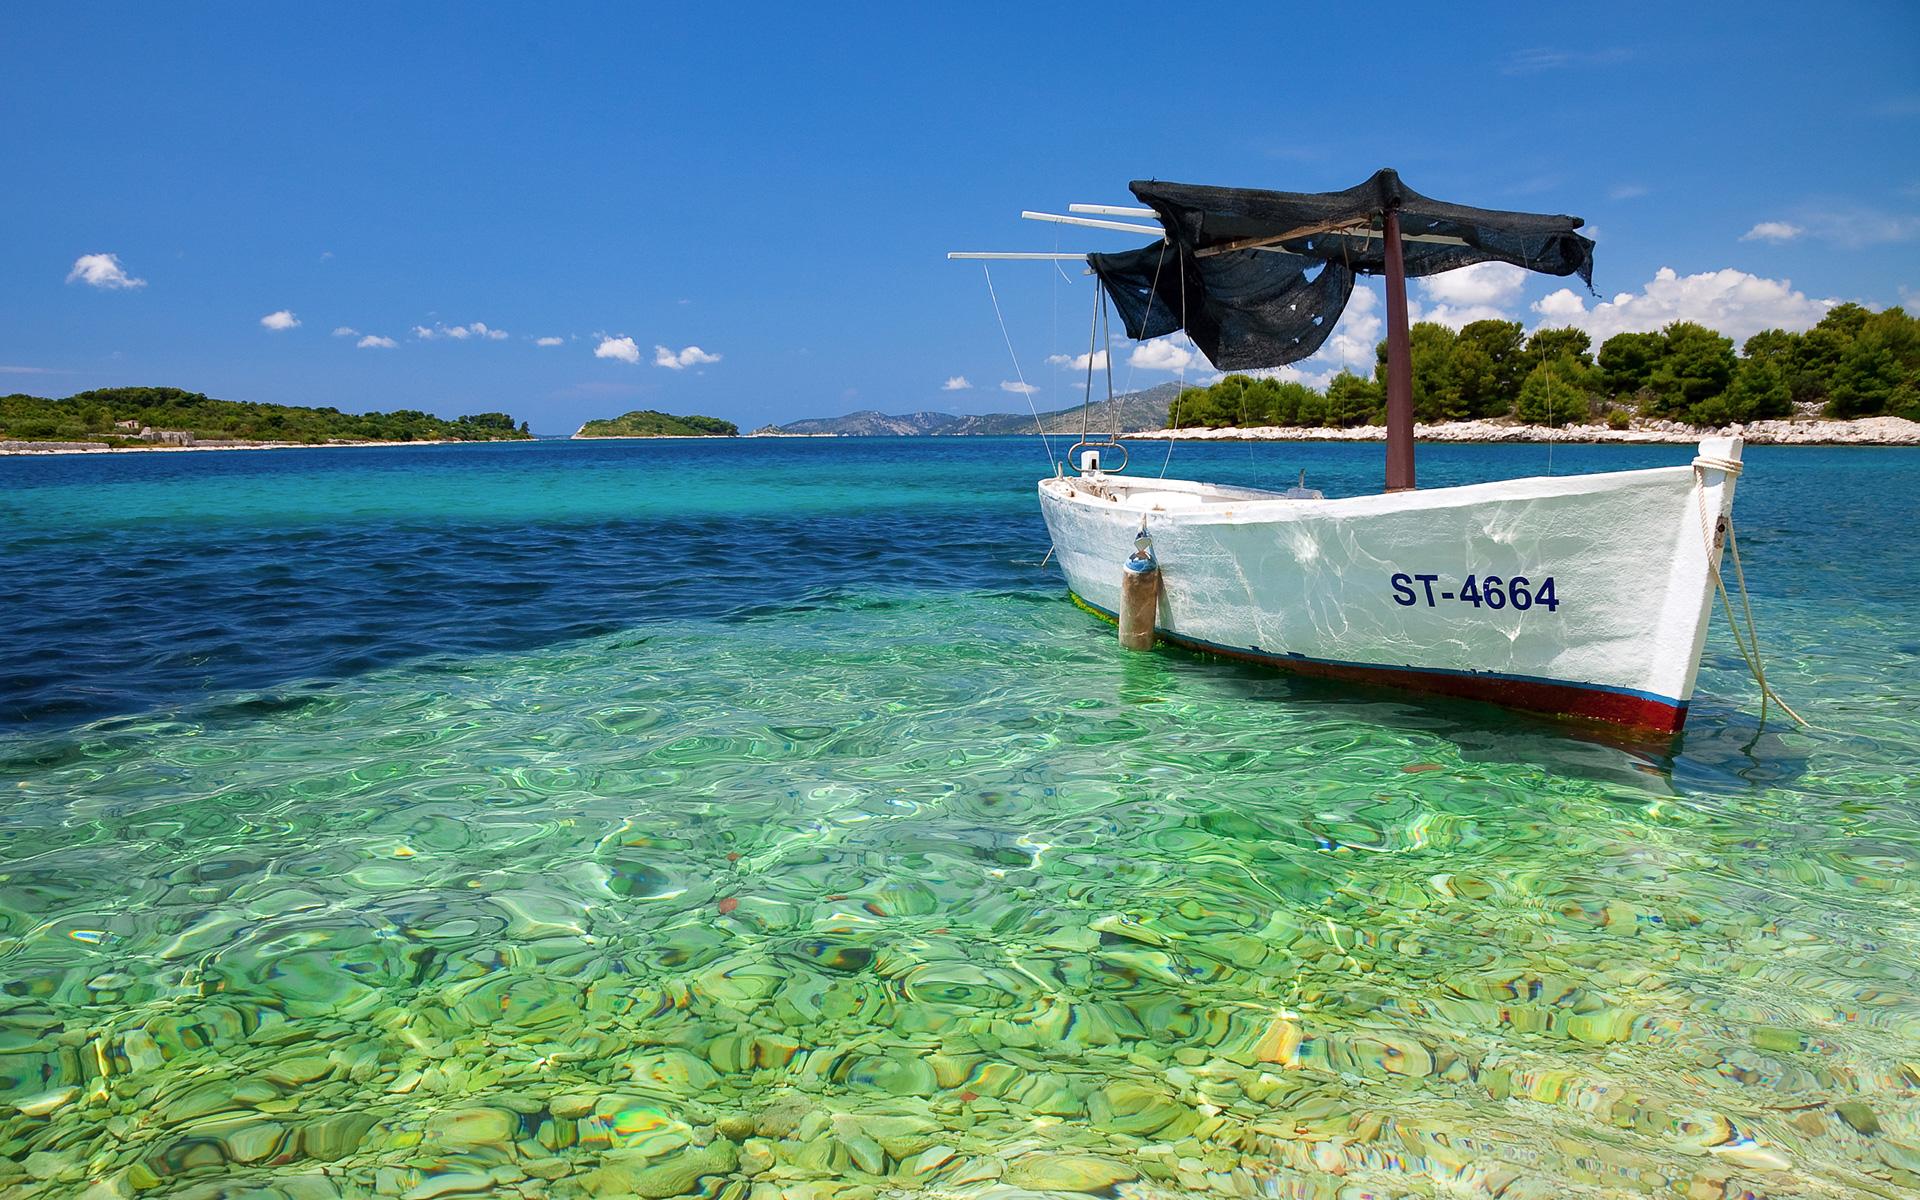 croatian botad hd wallpapers high resolution desktop boats images full